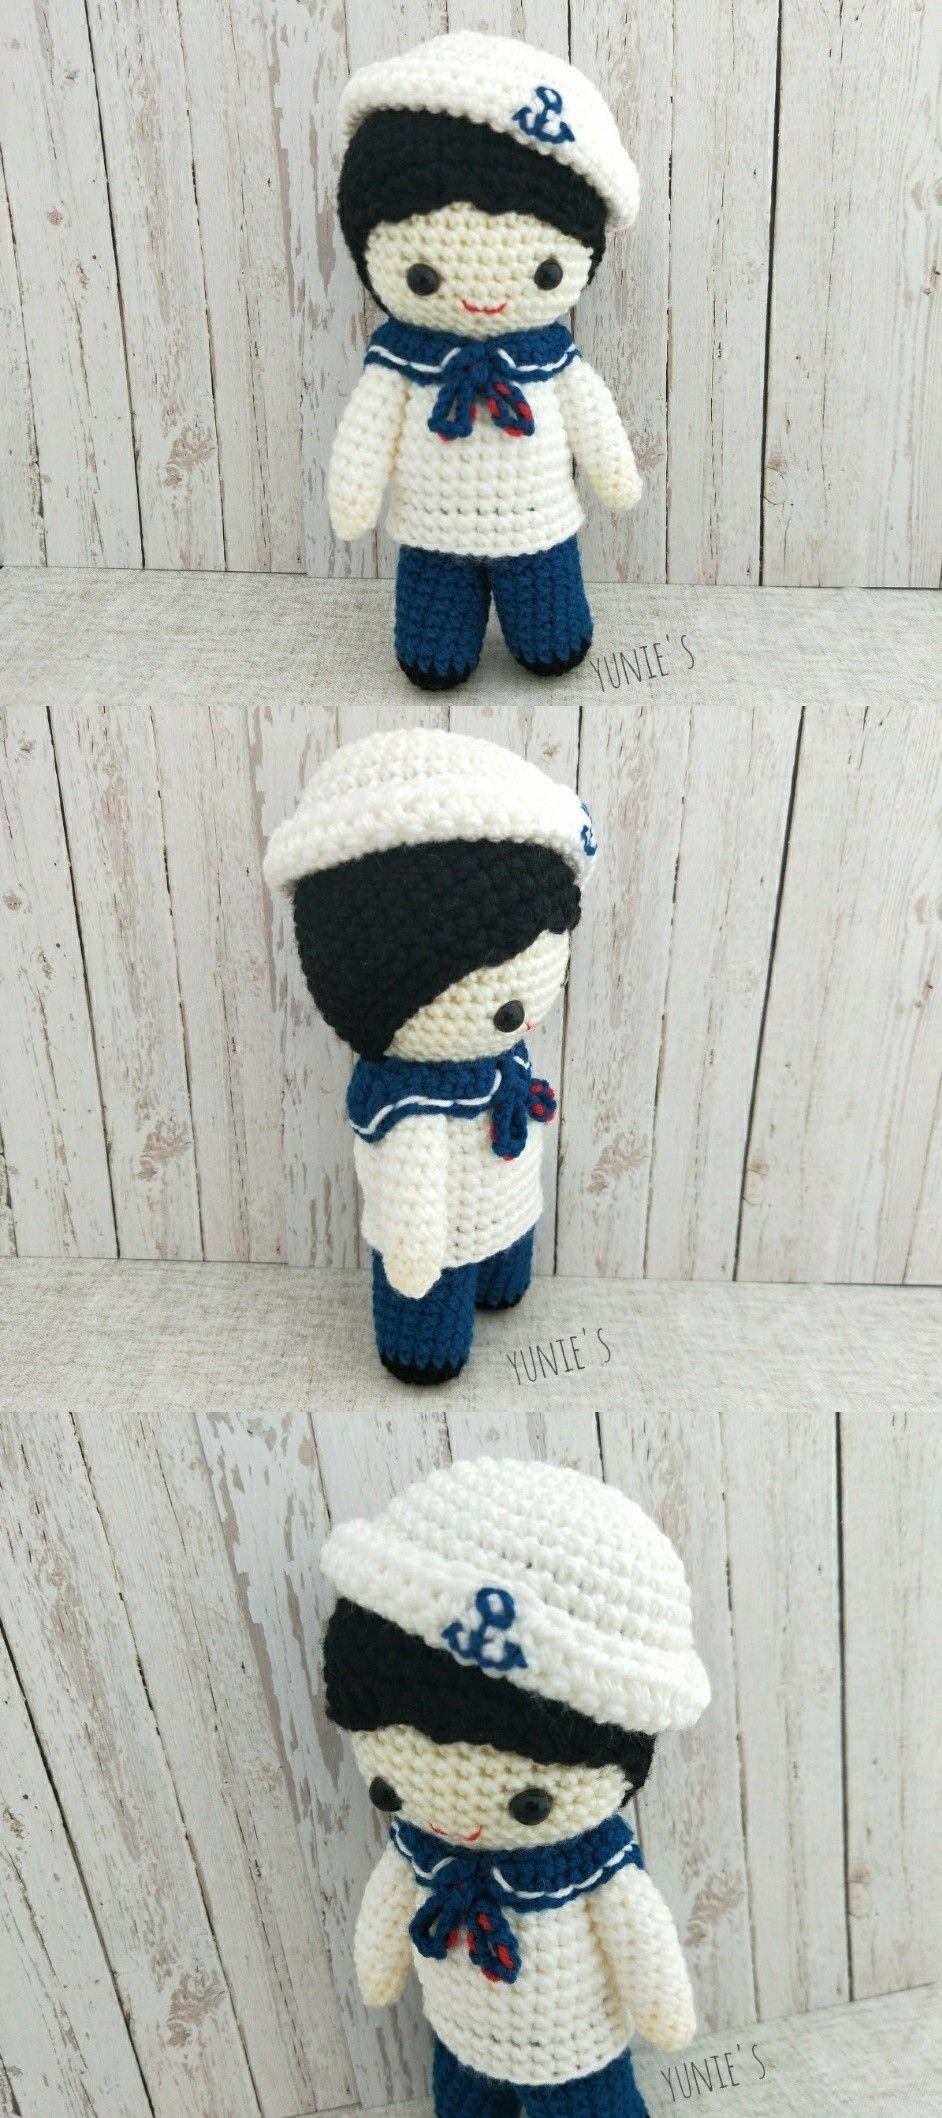 Crochet pattern Doll : Nautical Sailor Boy Doll Amigurumi Crochet ...